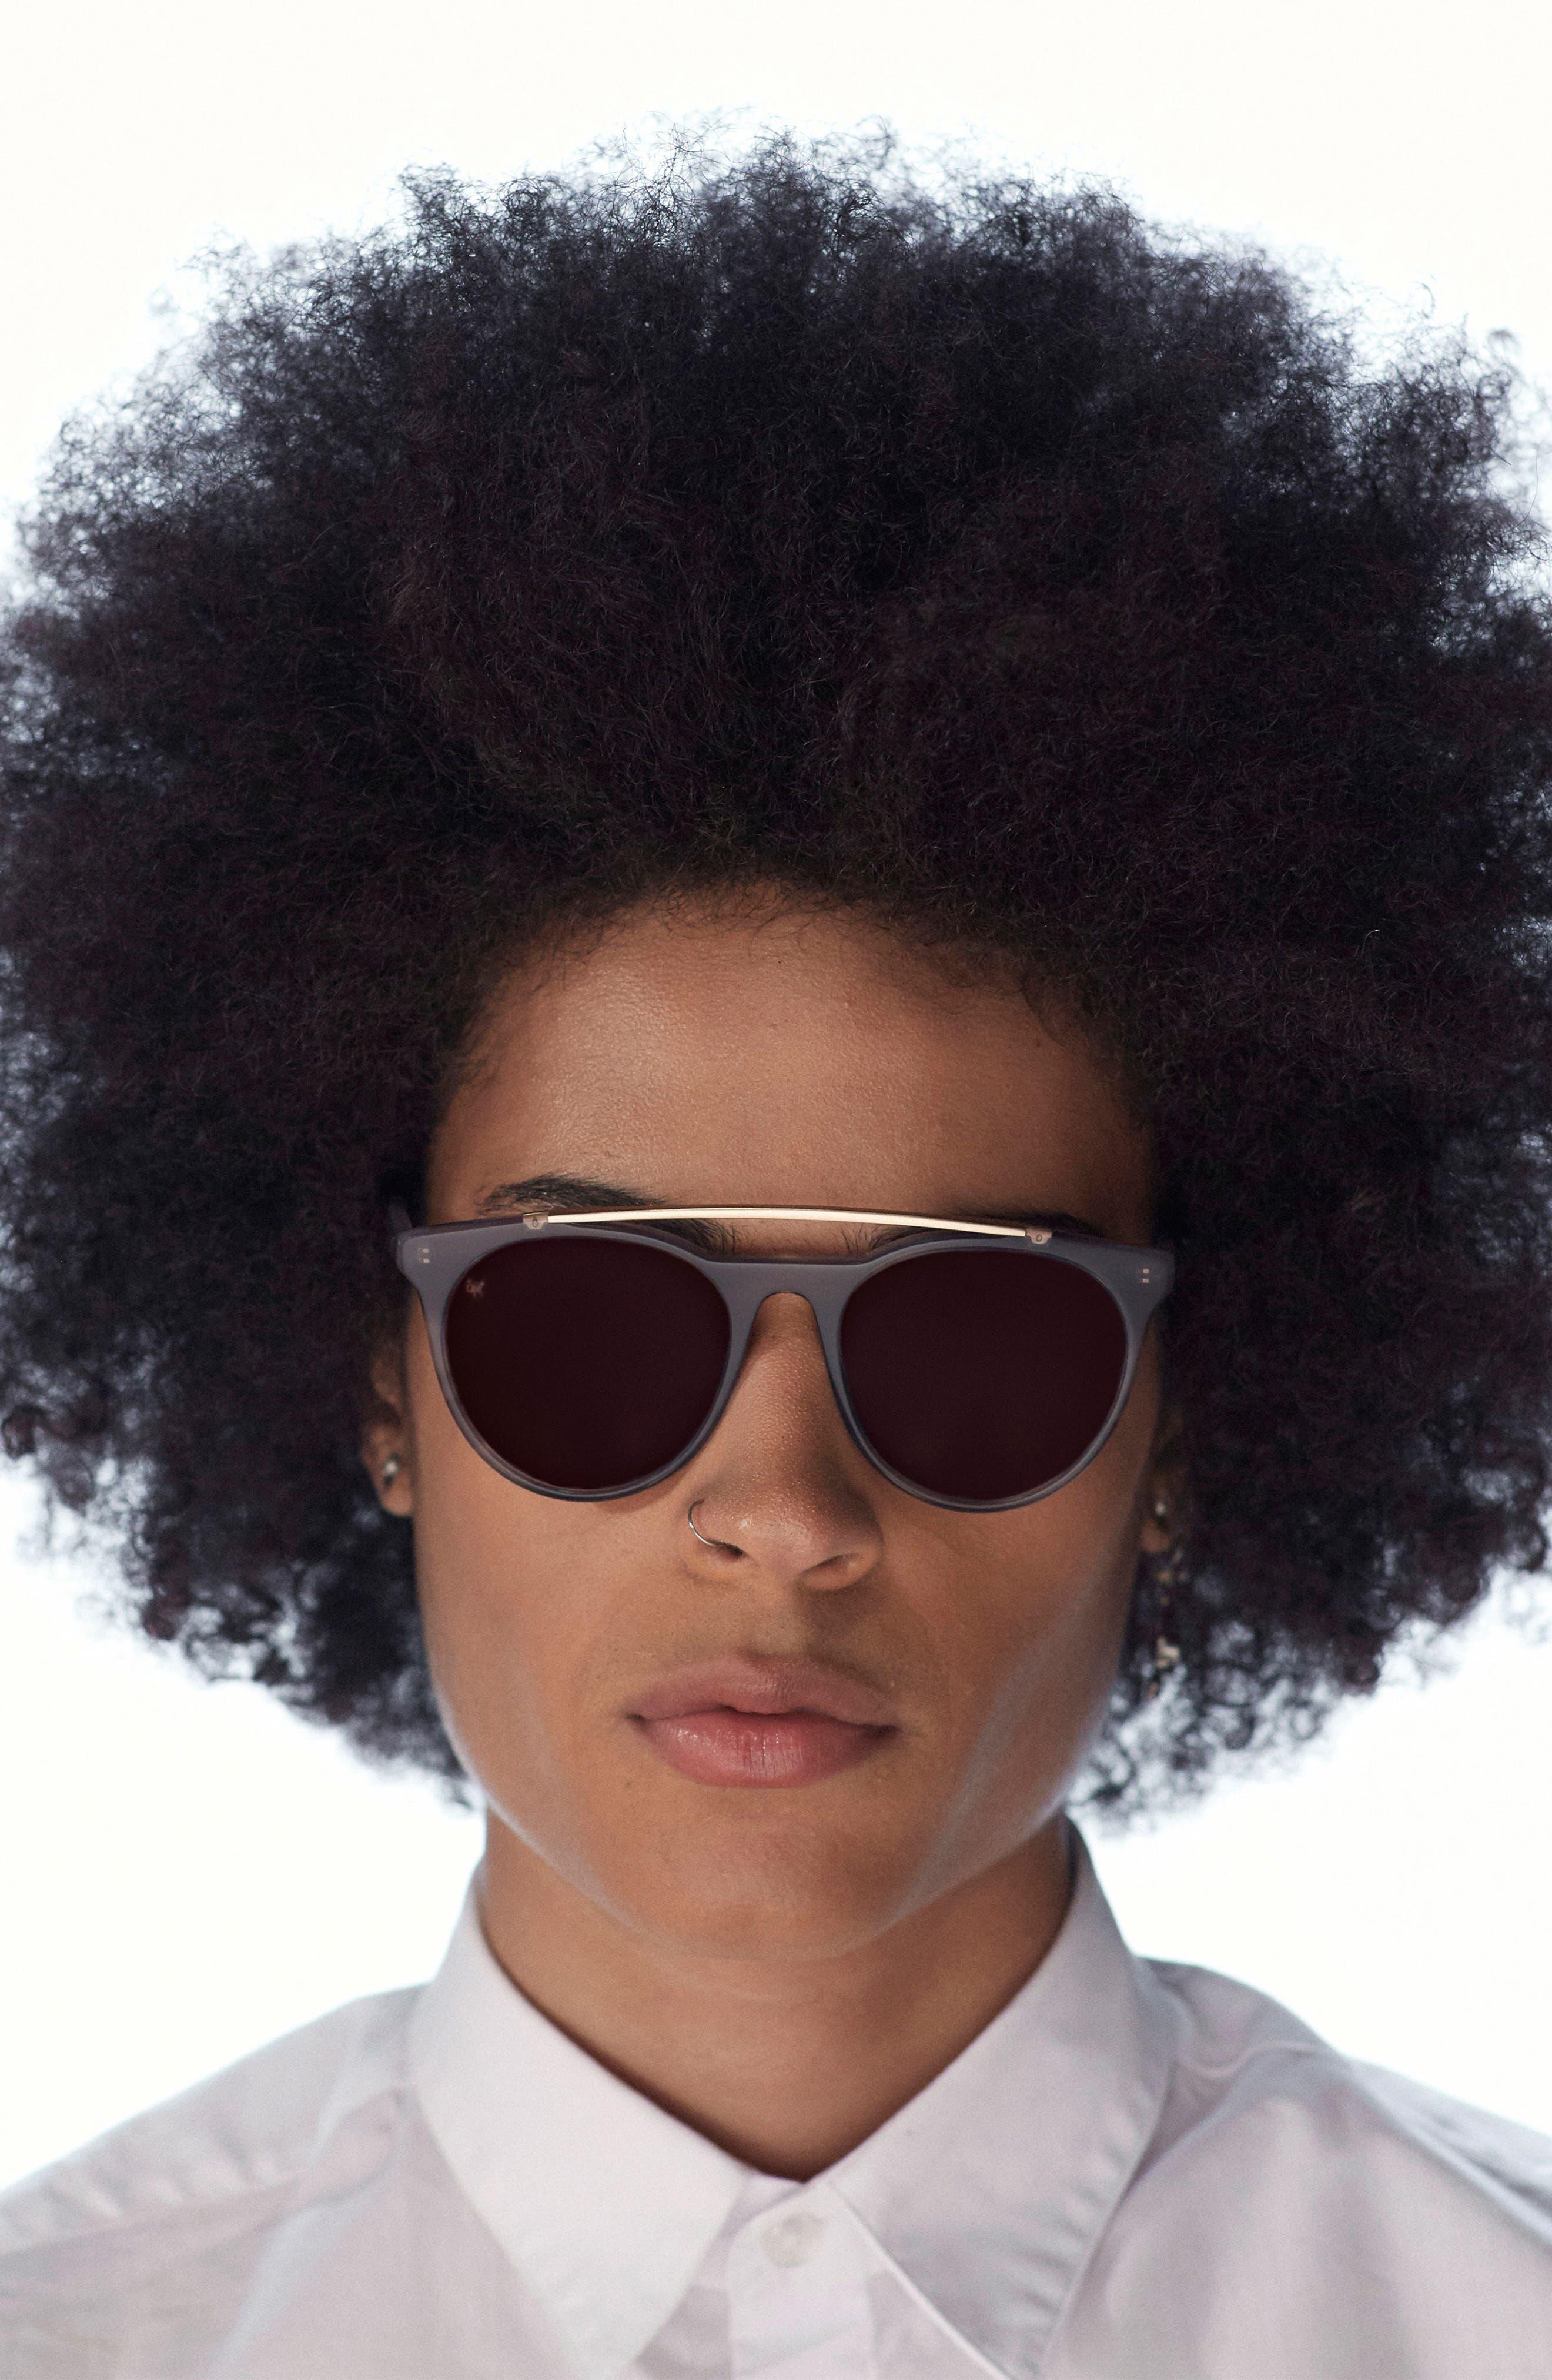 Sugarman 52mm Round Sunglasses,                             Alternate thumbnail 3, color,                             Black/ Matte Gold